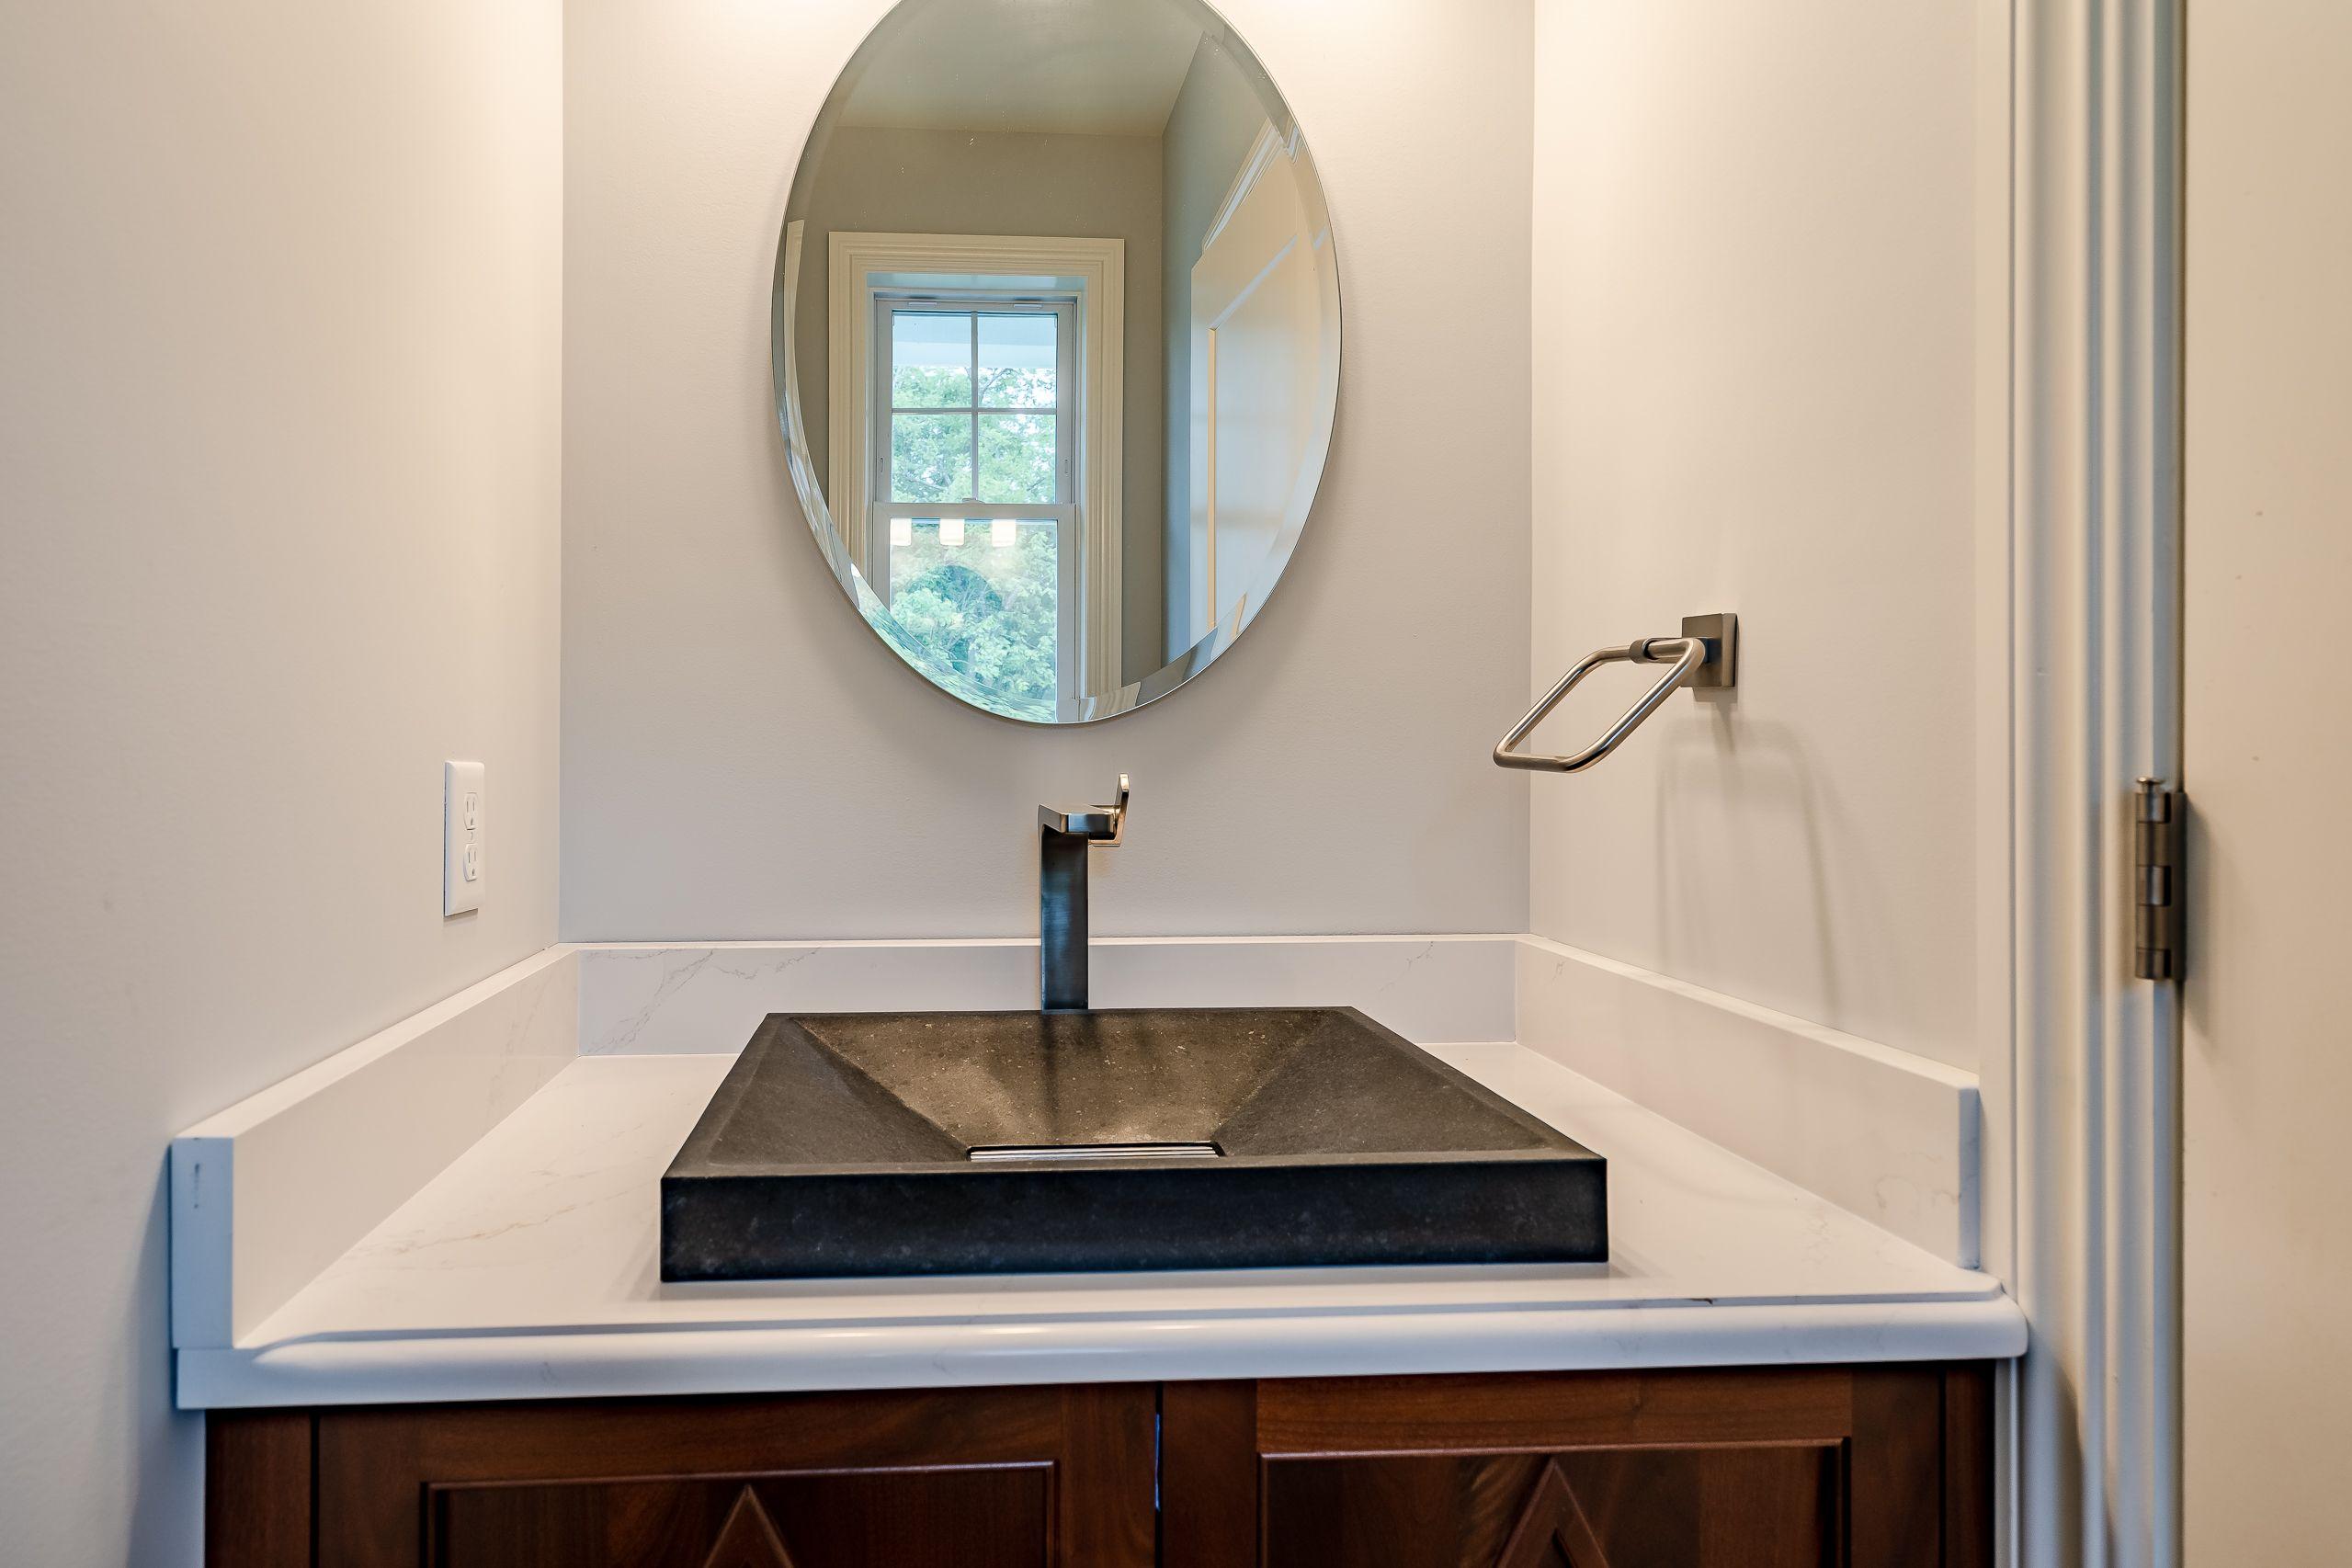 Bathroom featured in The Gwynwood By Cornerstone Premier Homes in Philadelphia, PA